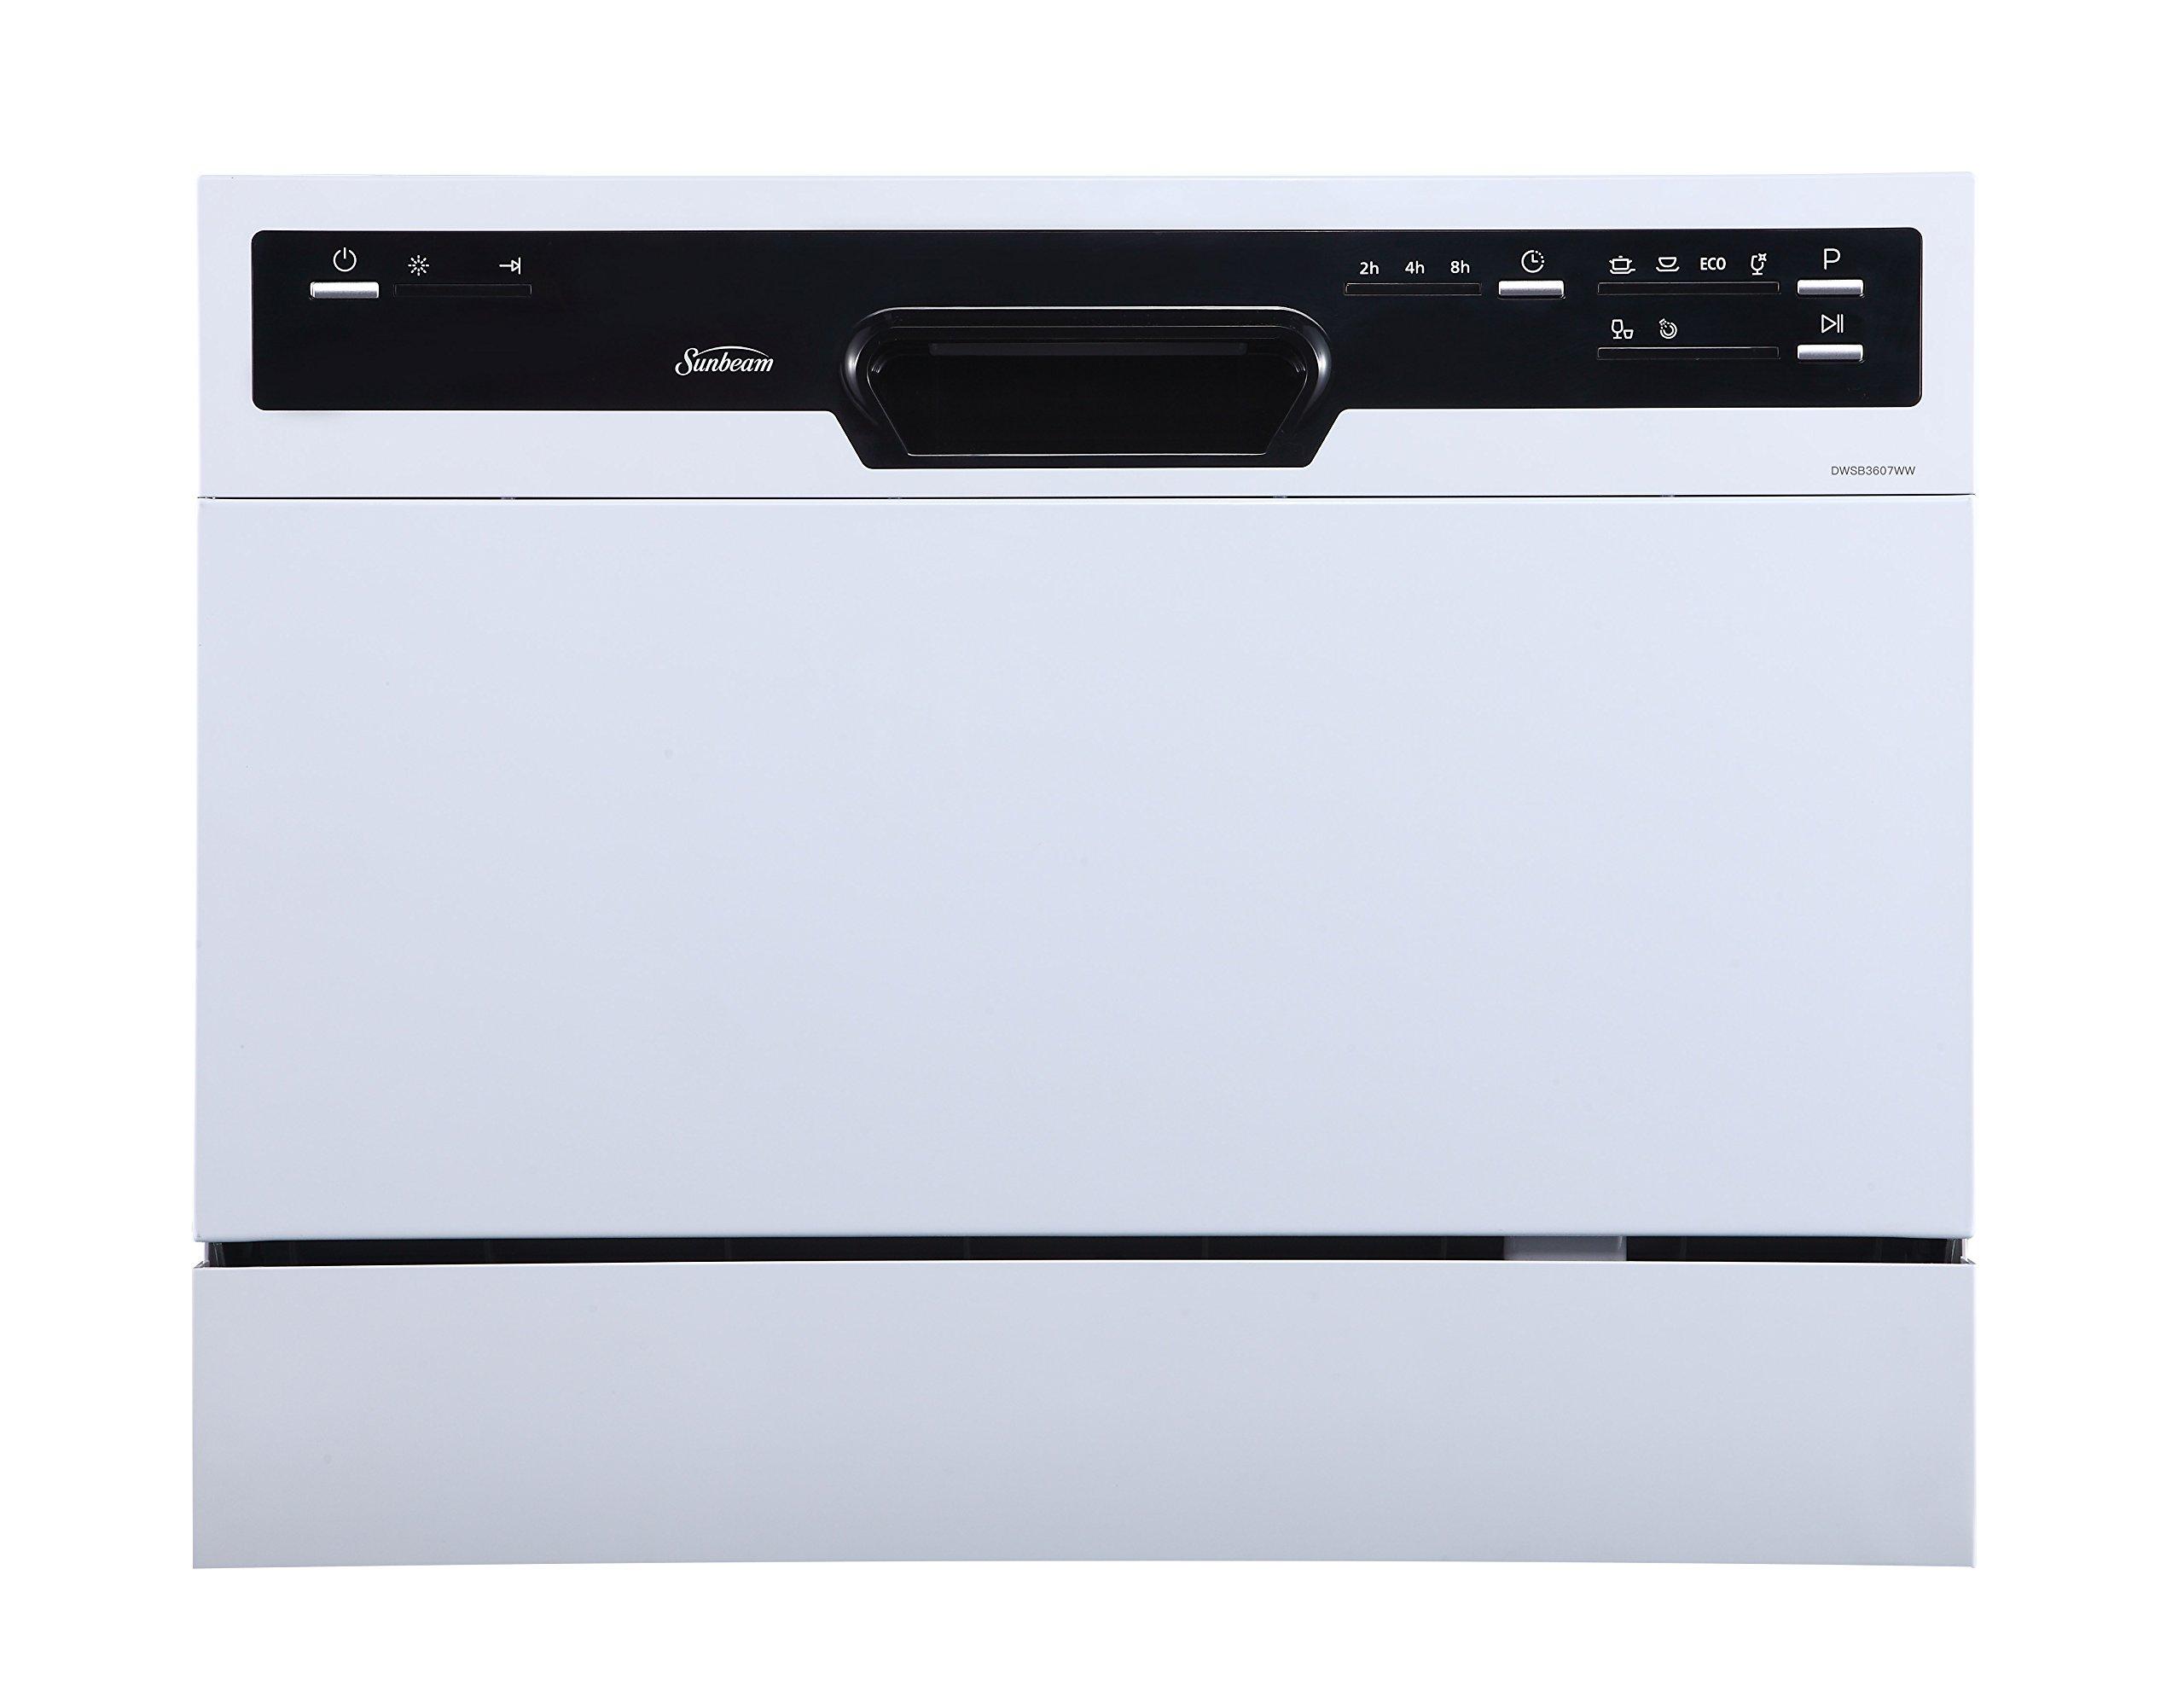 Sunbeam DWSB3607WW Portable Countertop Dishwasher with Rinse Aid Dispenser, White